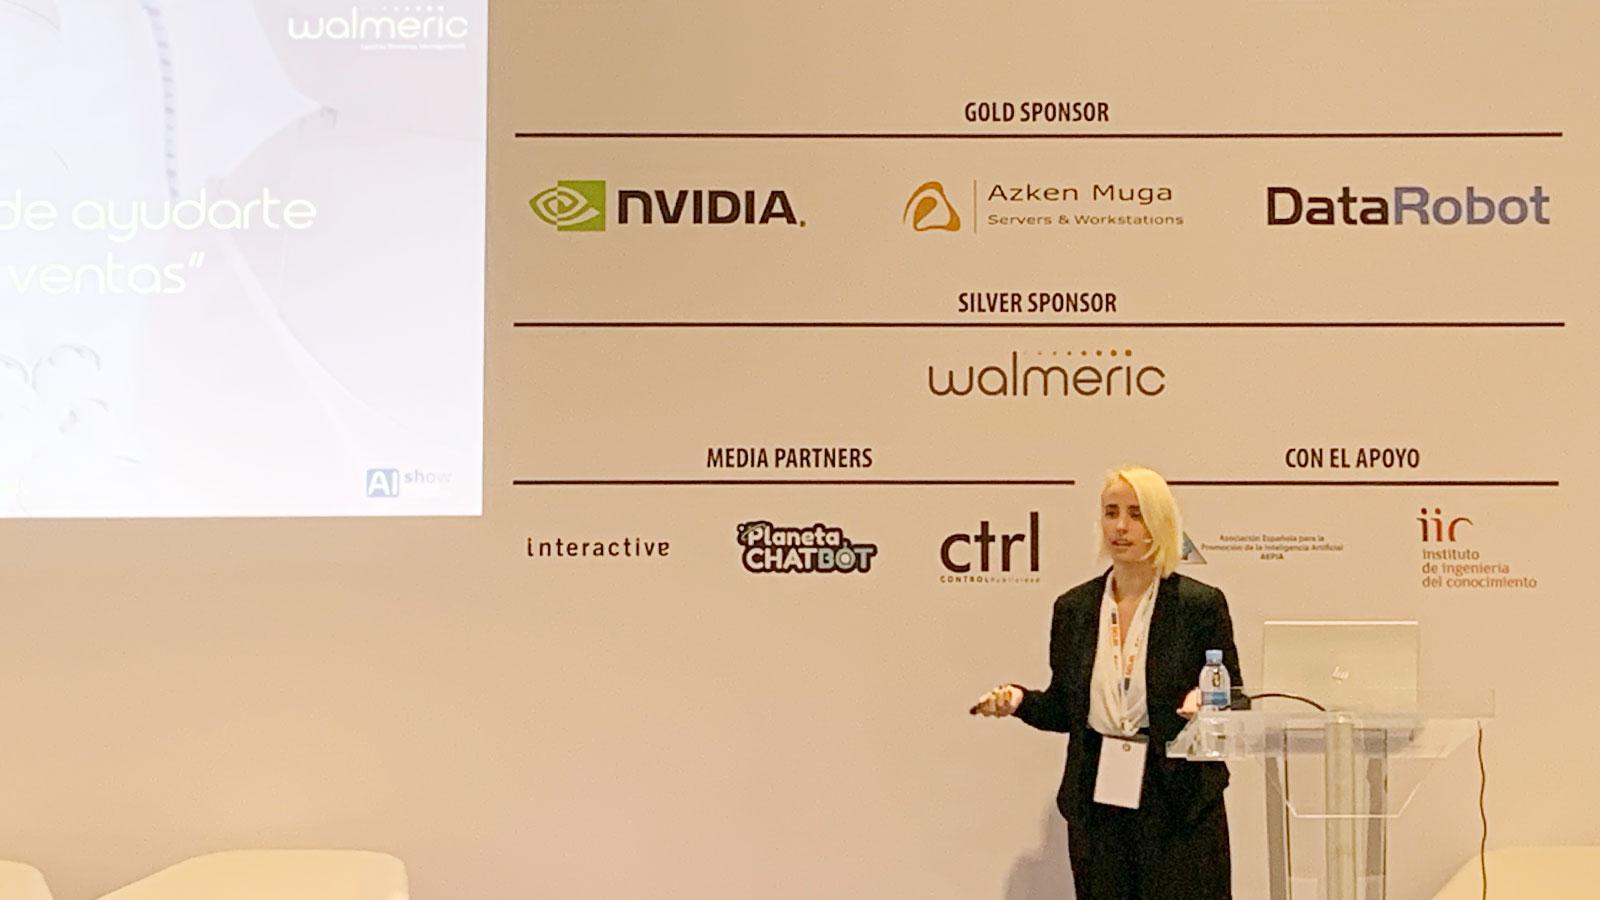 Irene Medina, Marketing Director at Walmeric, giving a talk in AIshow